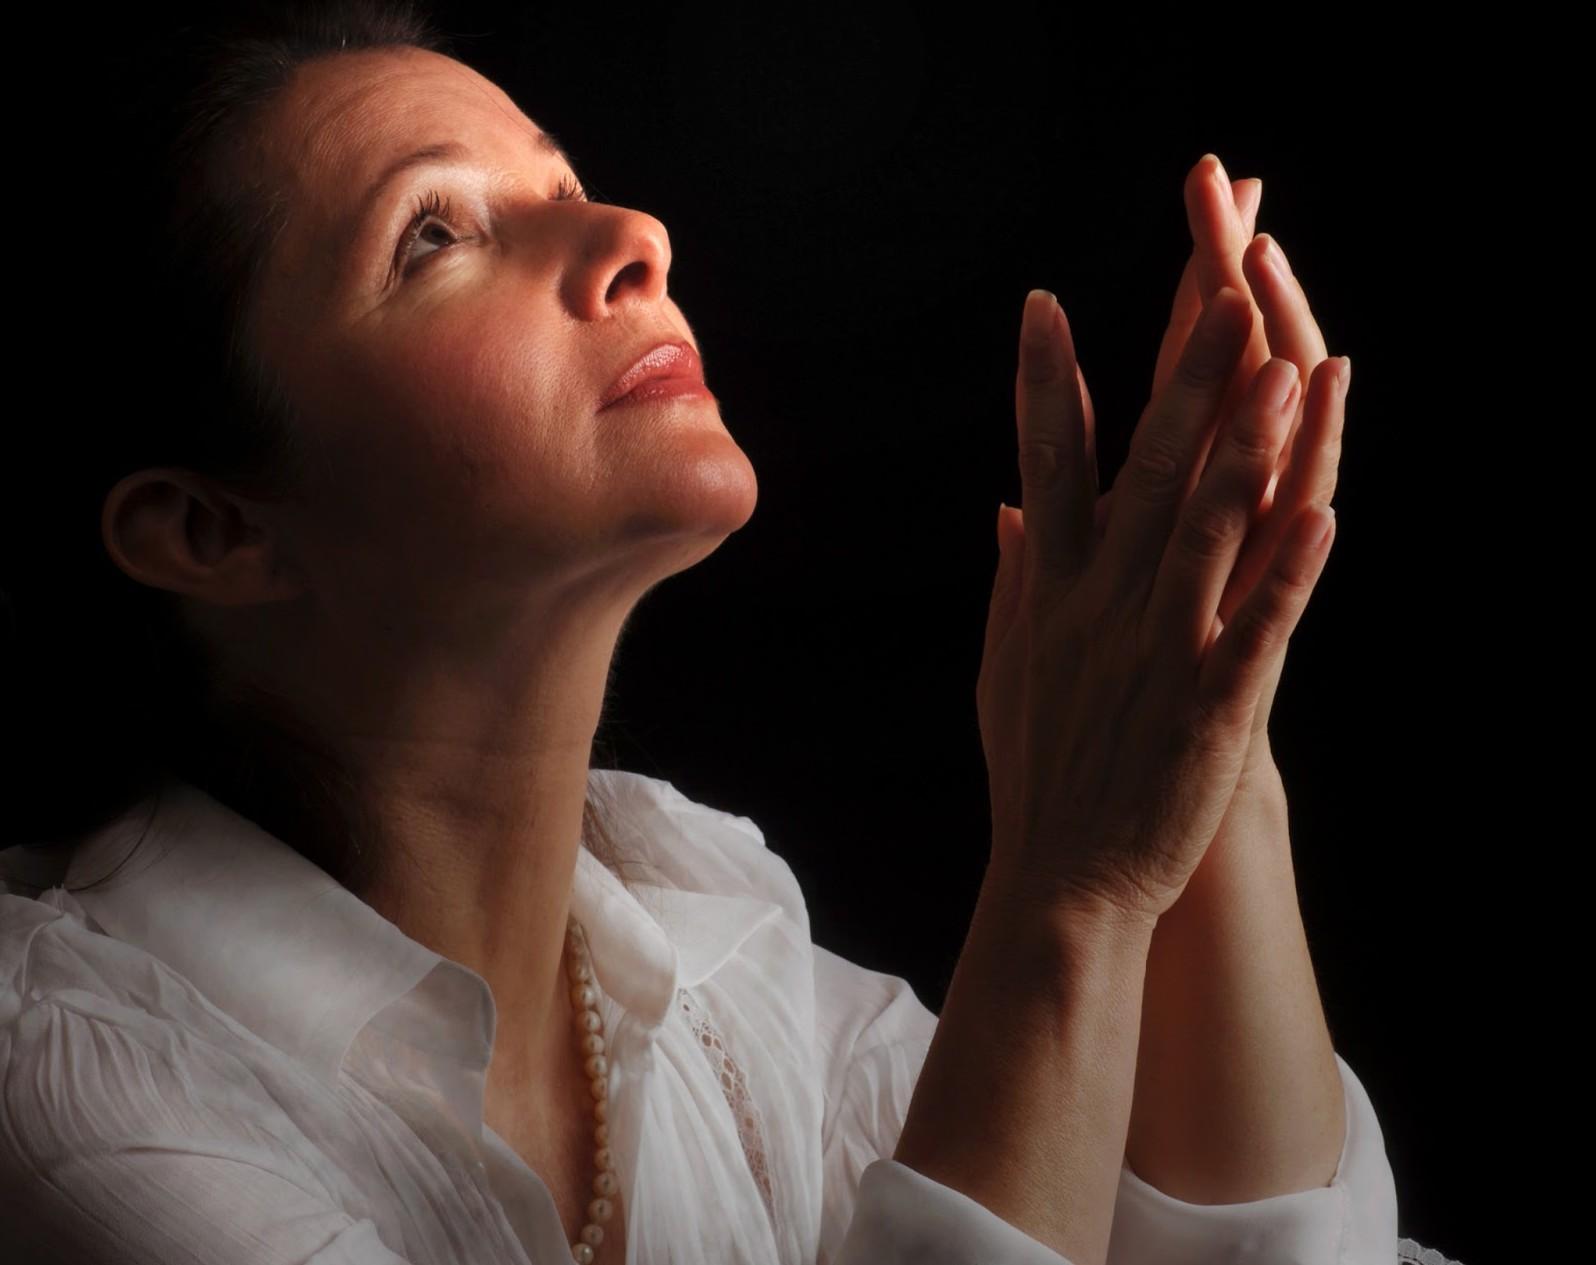 mujer orando fondo